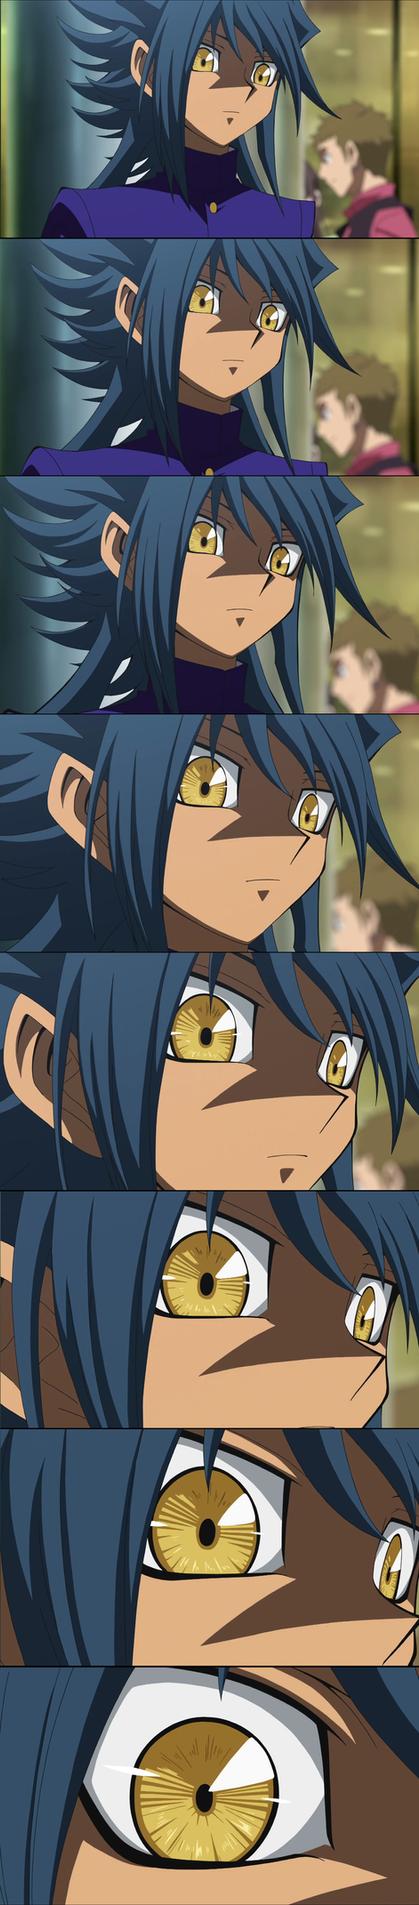 Aigami eye ! by dragonballzCZ